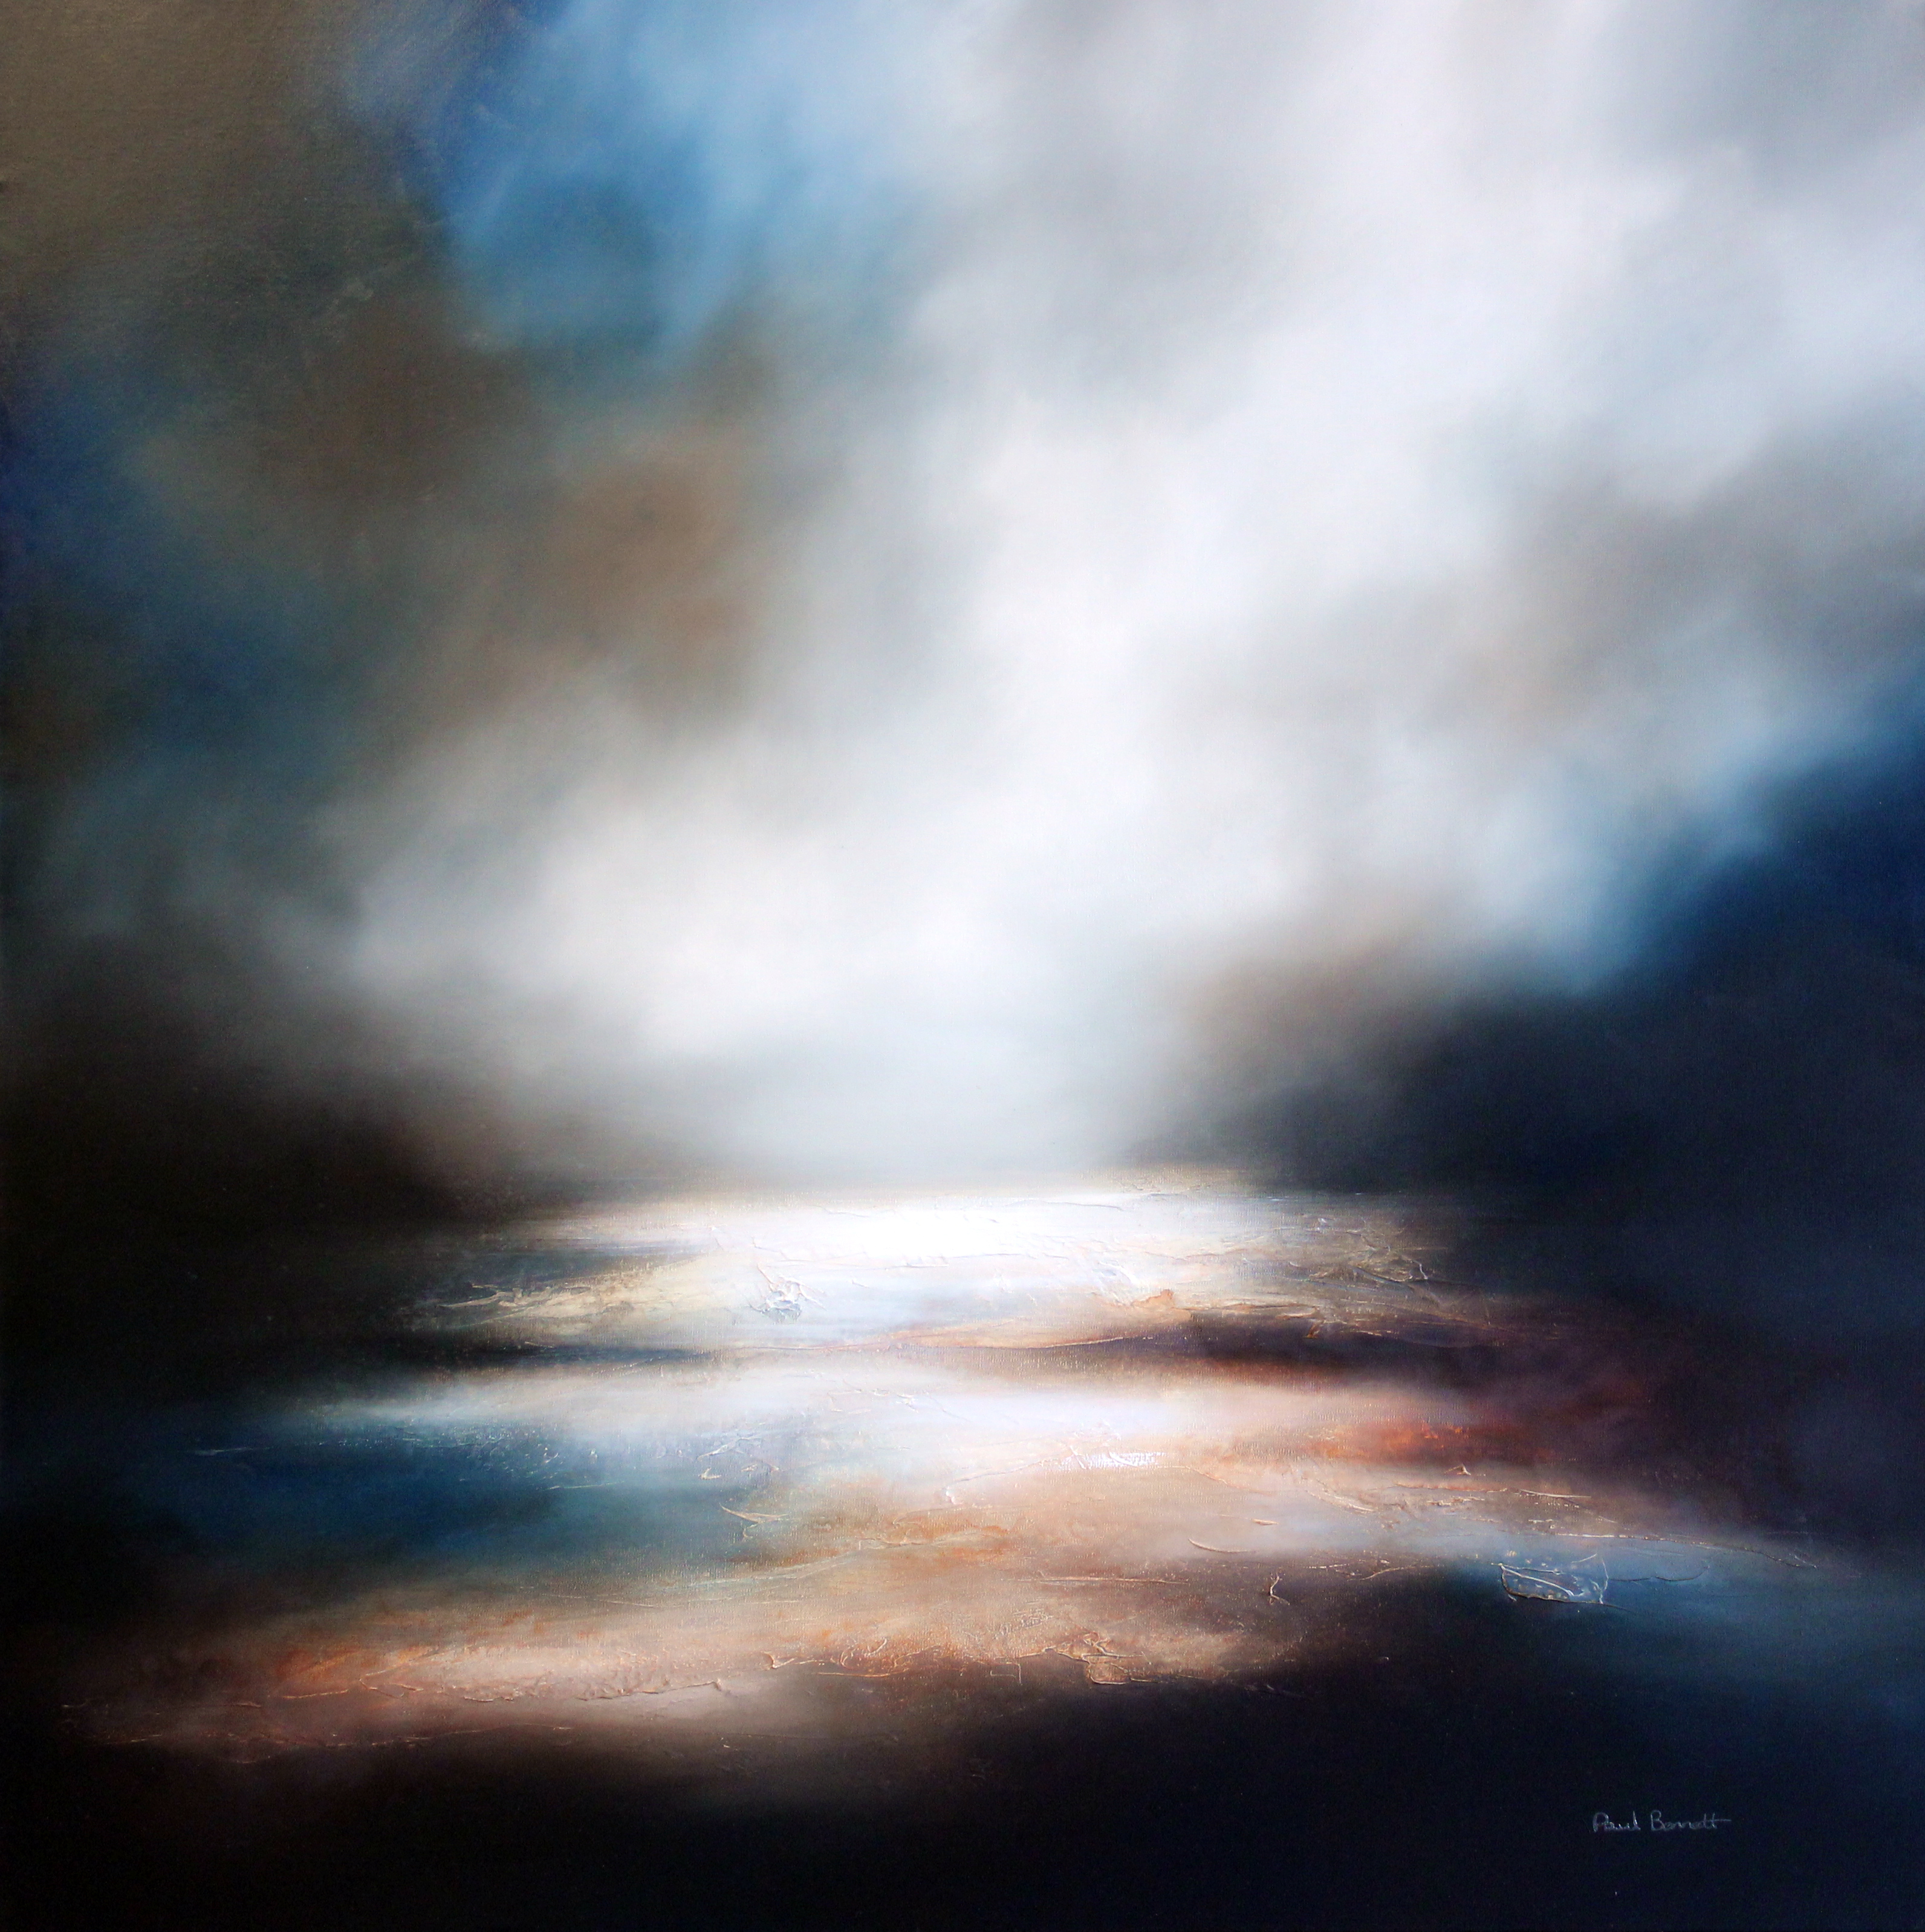 Paul Bennett: The Valley of Dawn, 99 x 99cm, oil on canvas | Stellar Depth | Saturday 17 June  – Wednesday 30 August 2017 | Gormley's Fine Art, Dublin